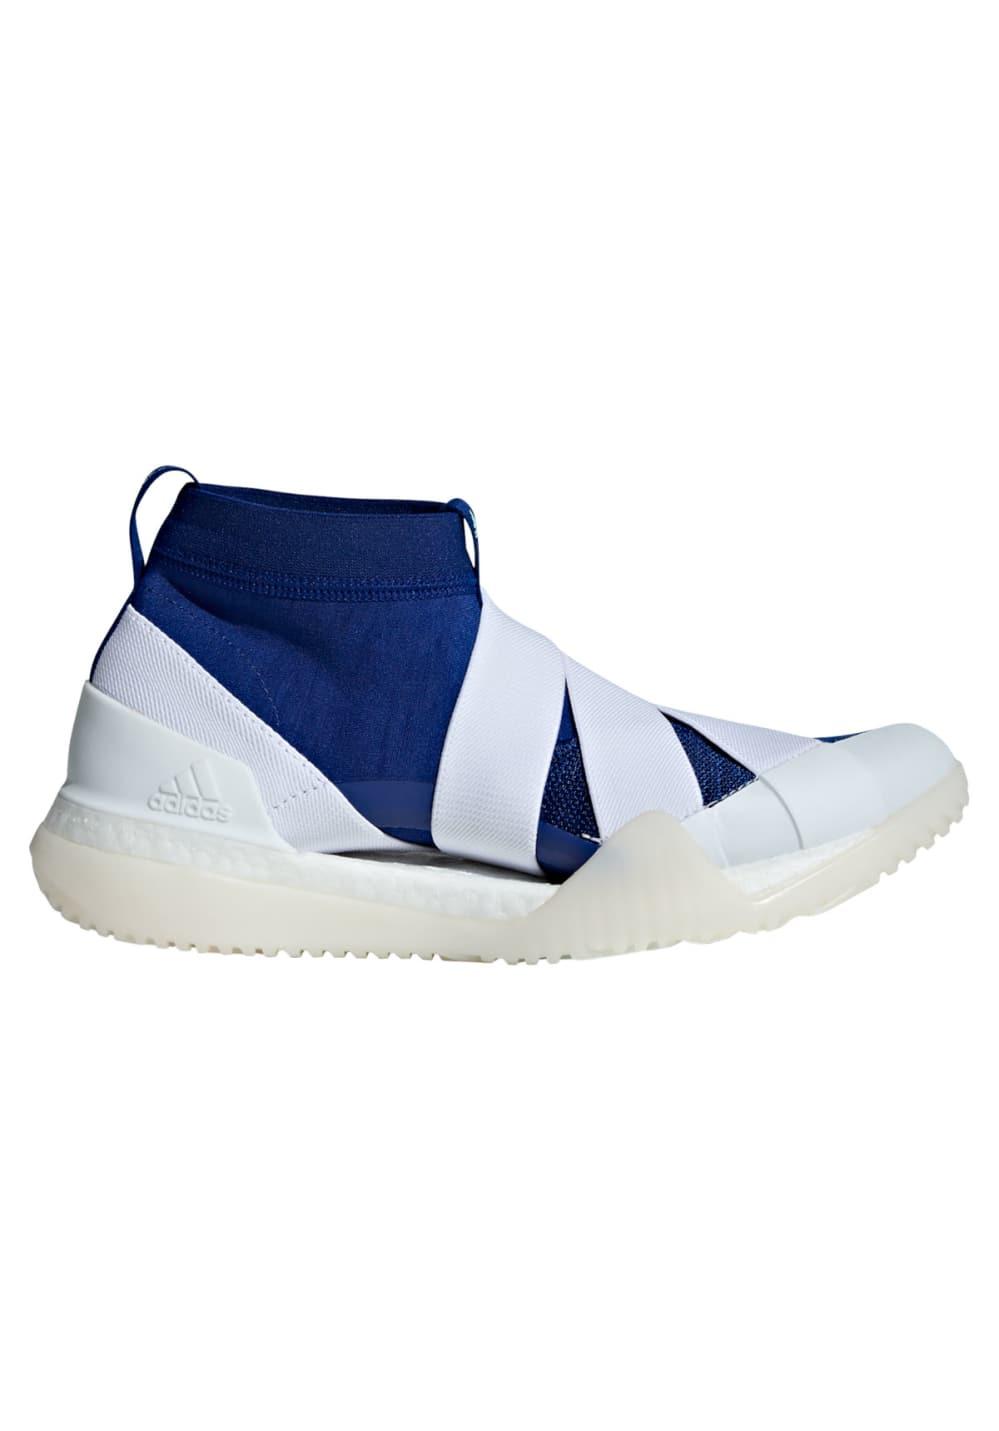 adidas PureBOOST X TRAINER 3.0 LL Chaussures fitness pour Femme Bleu